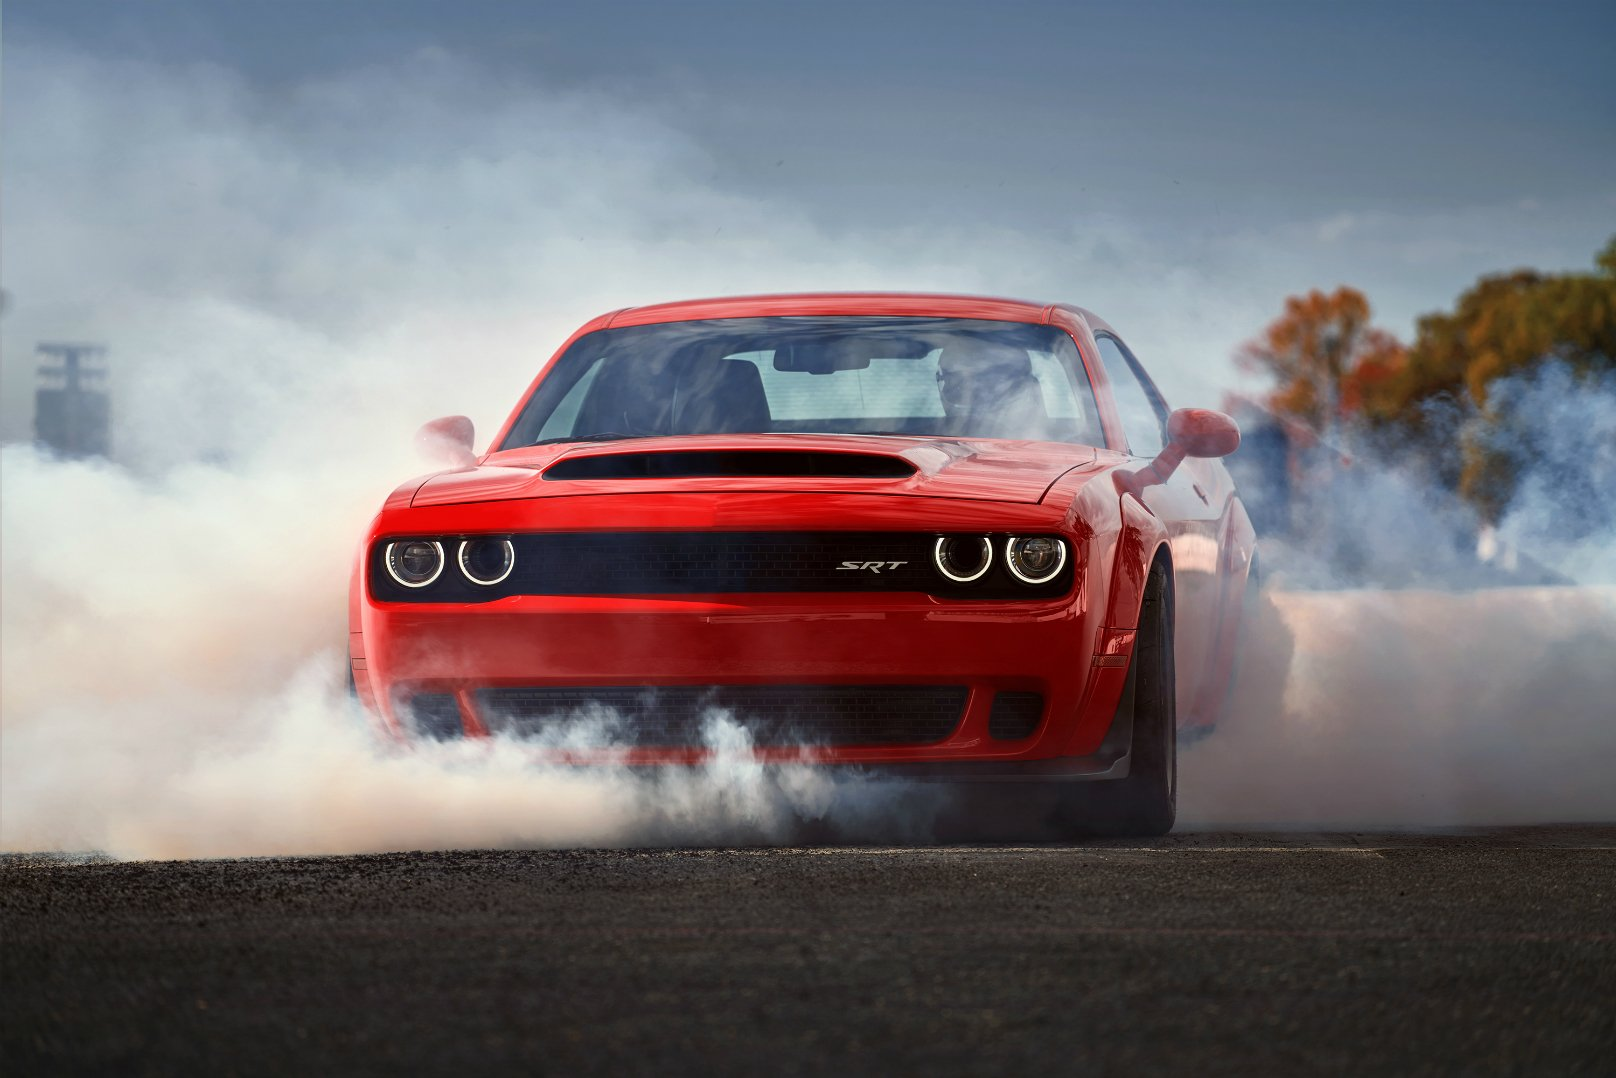 28 Dodge Challenger Srt Demon Hd Wallpapers Background